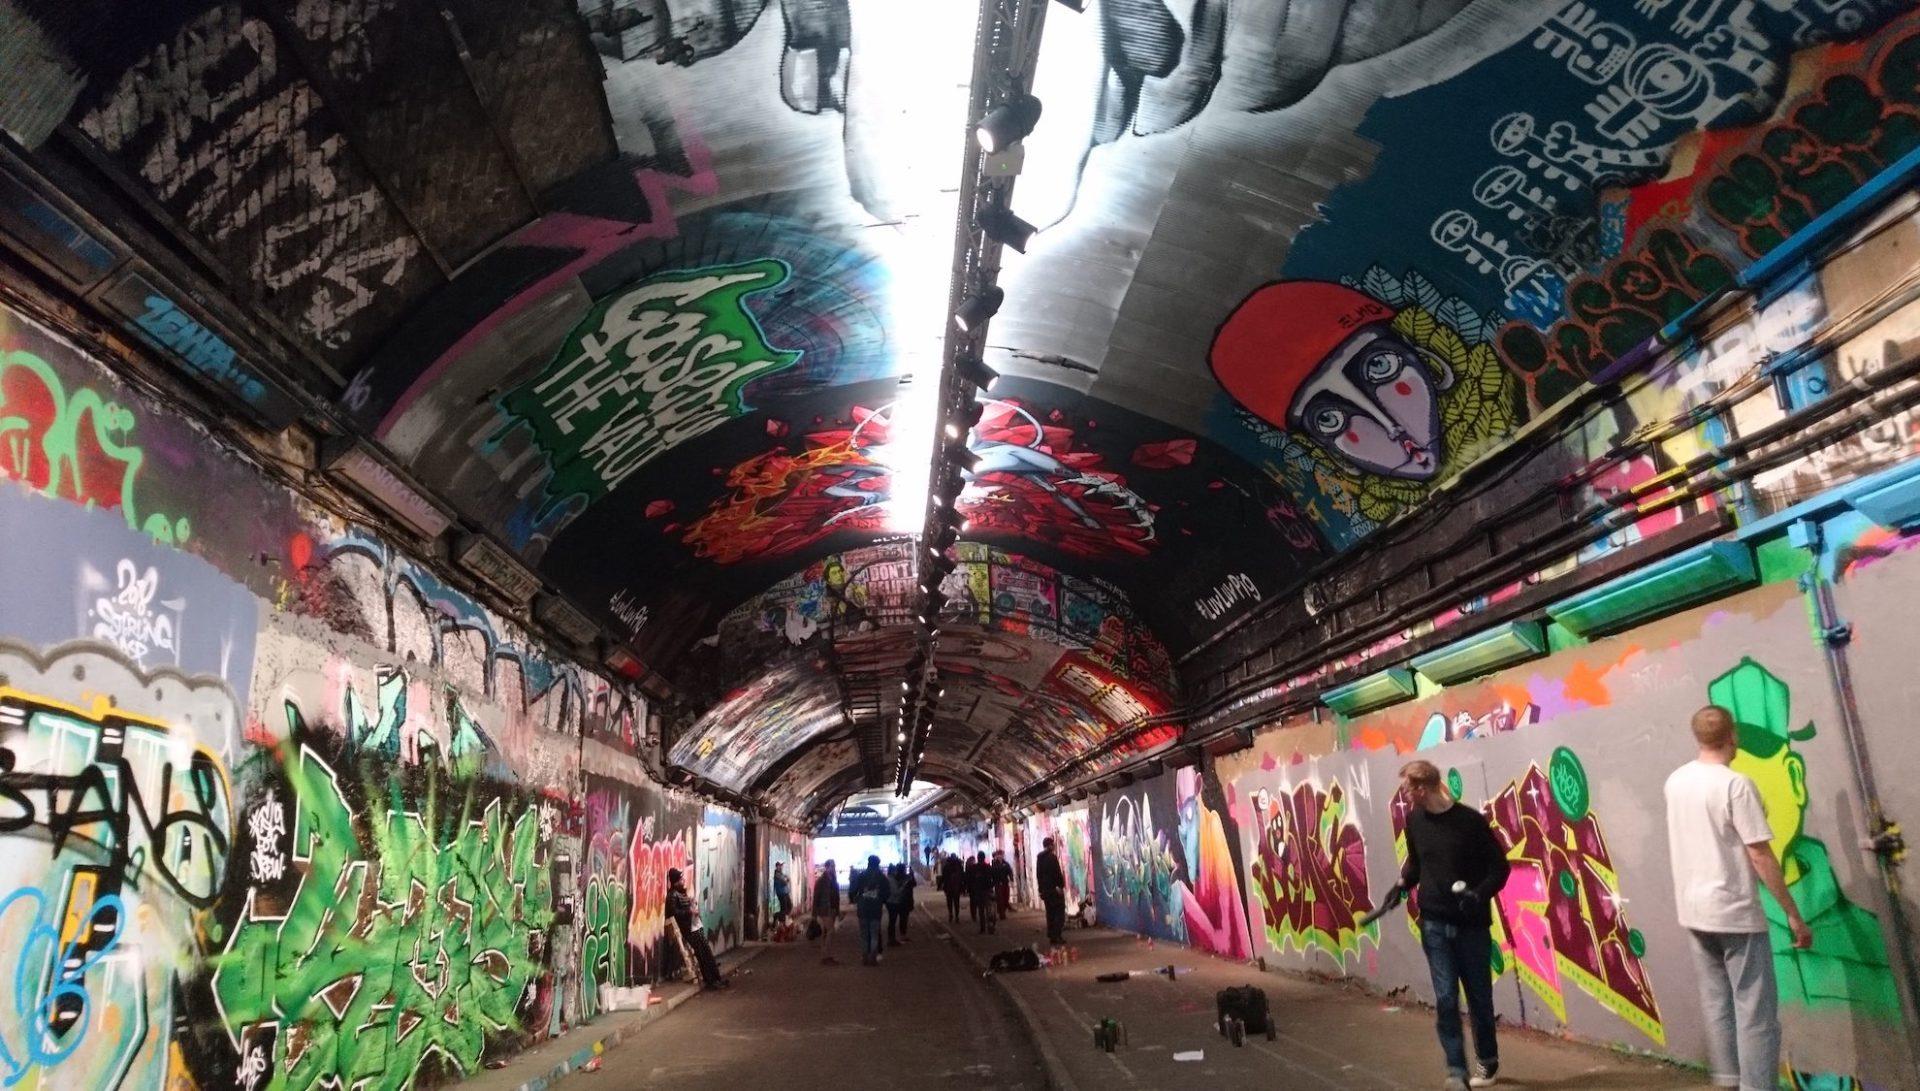 Graffiti at The Vaults, London